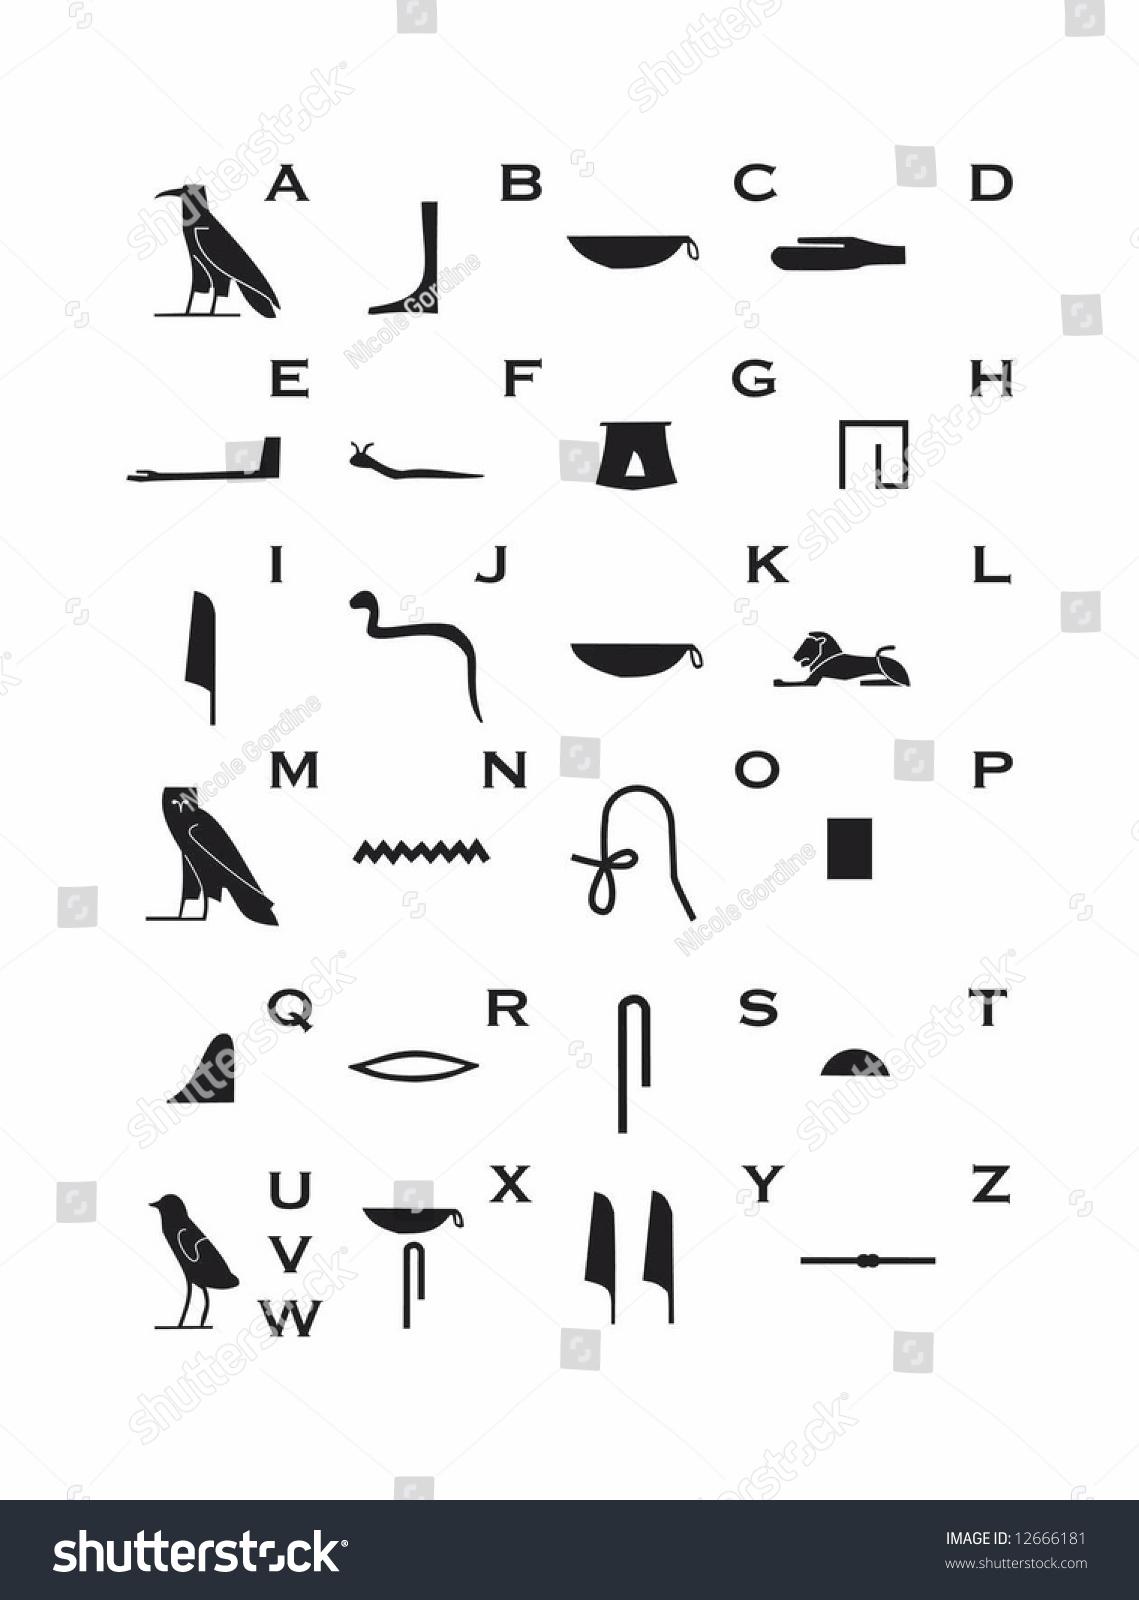 Hieroglyphic Alphabet Stock Vector